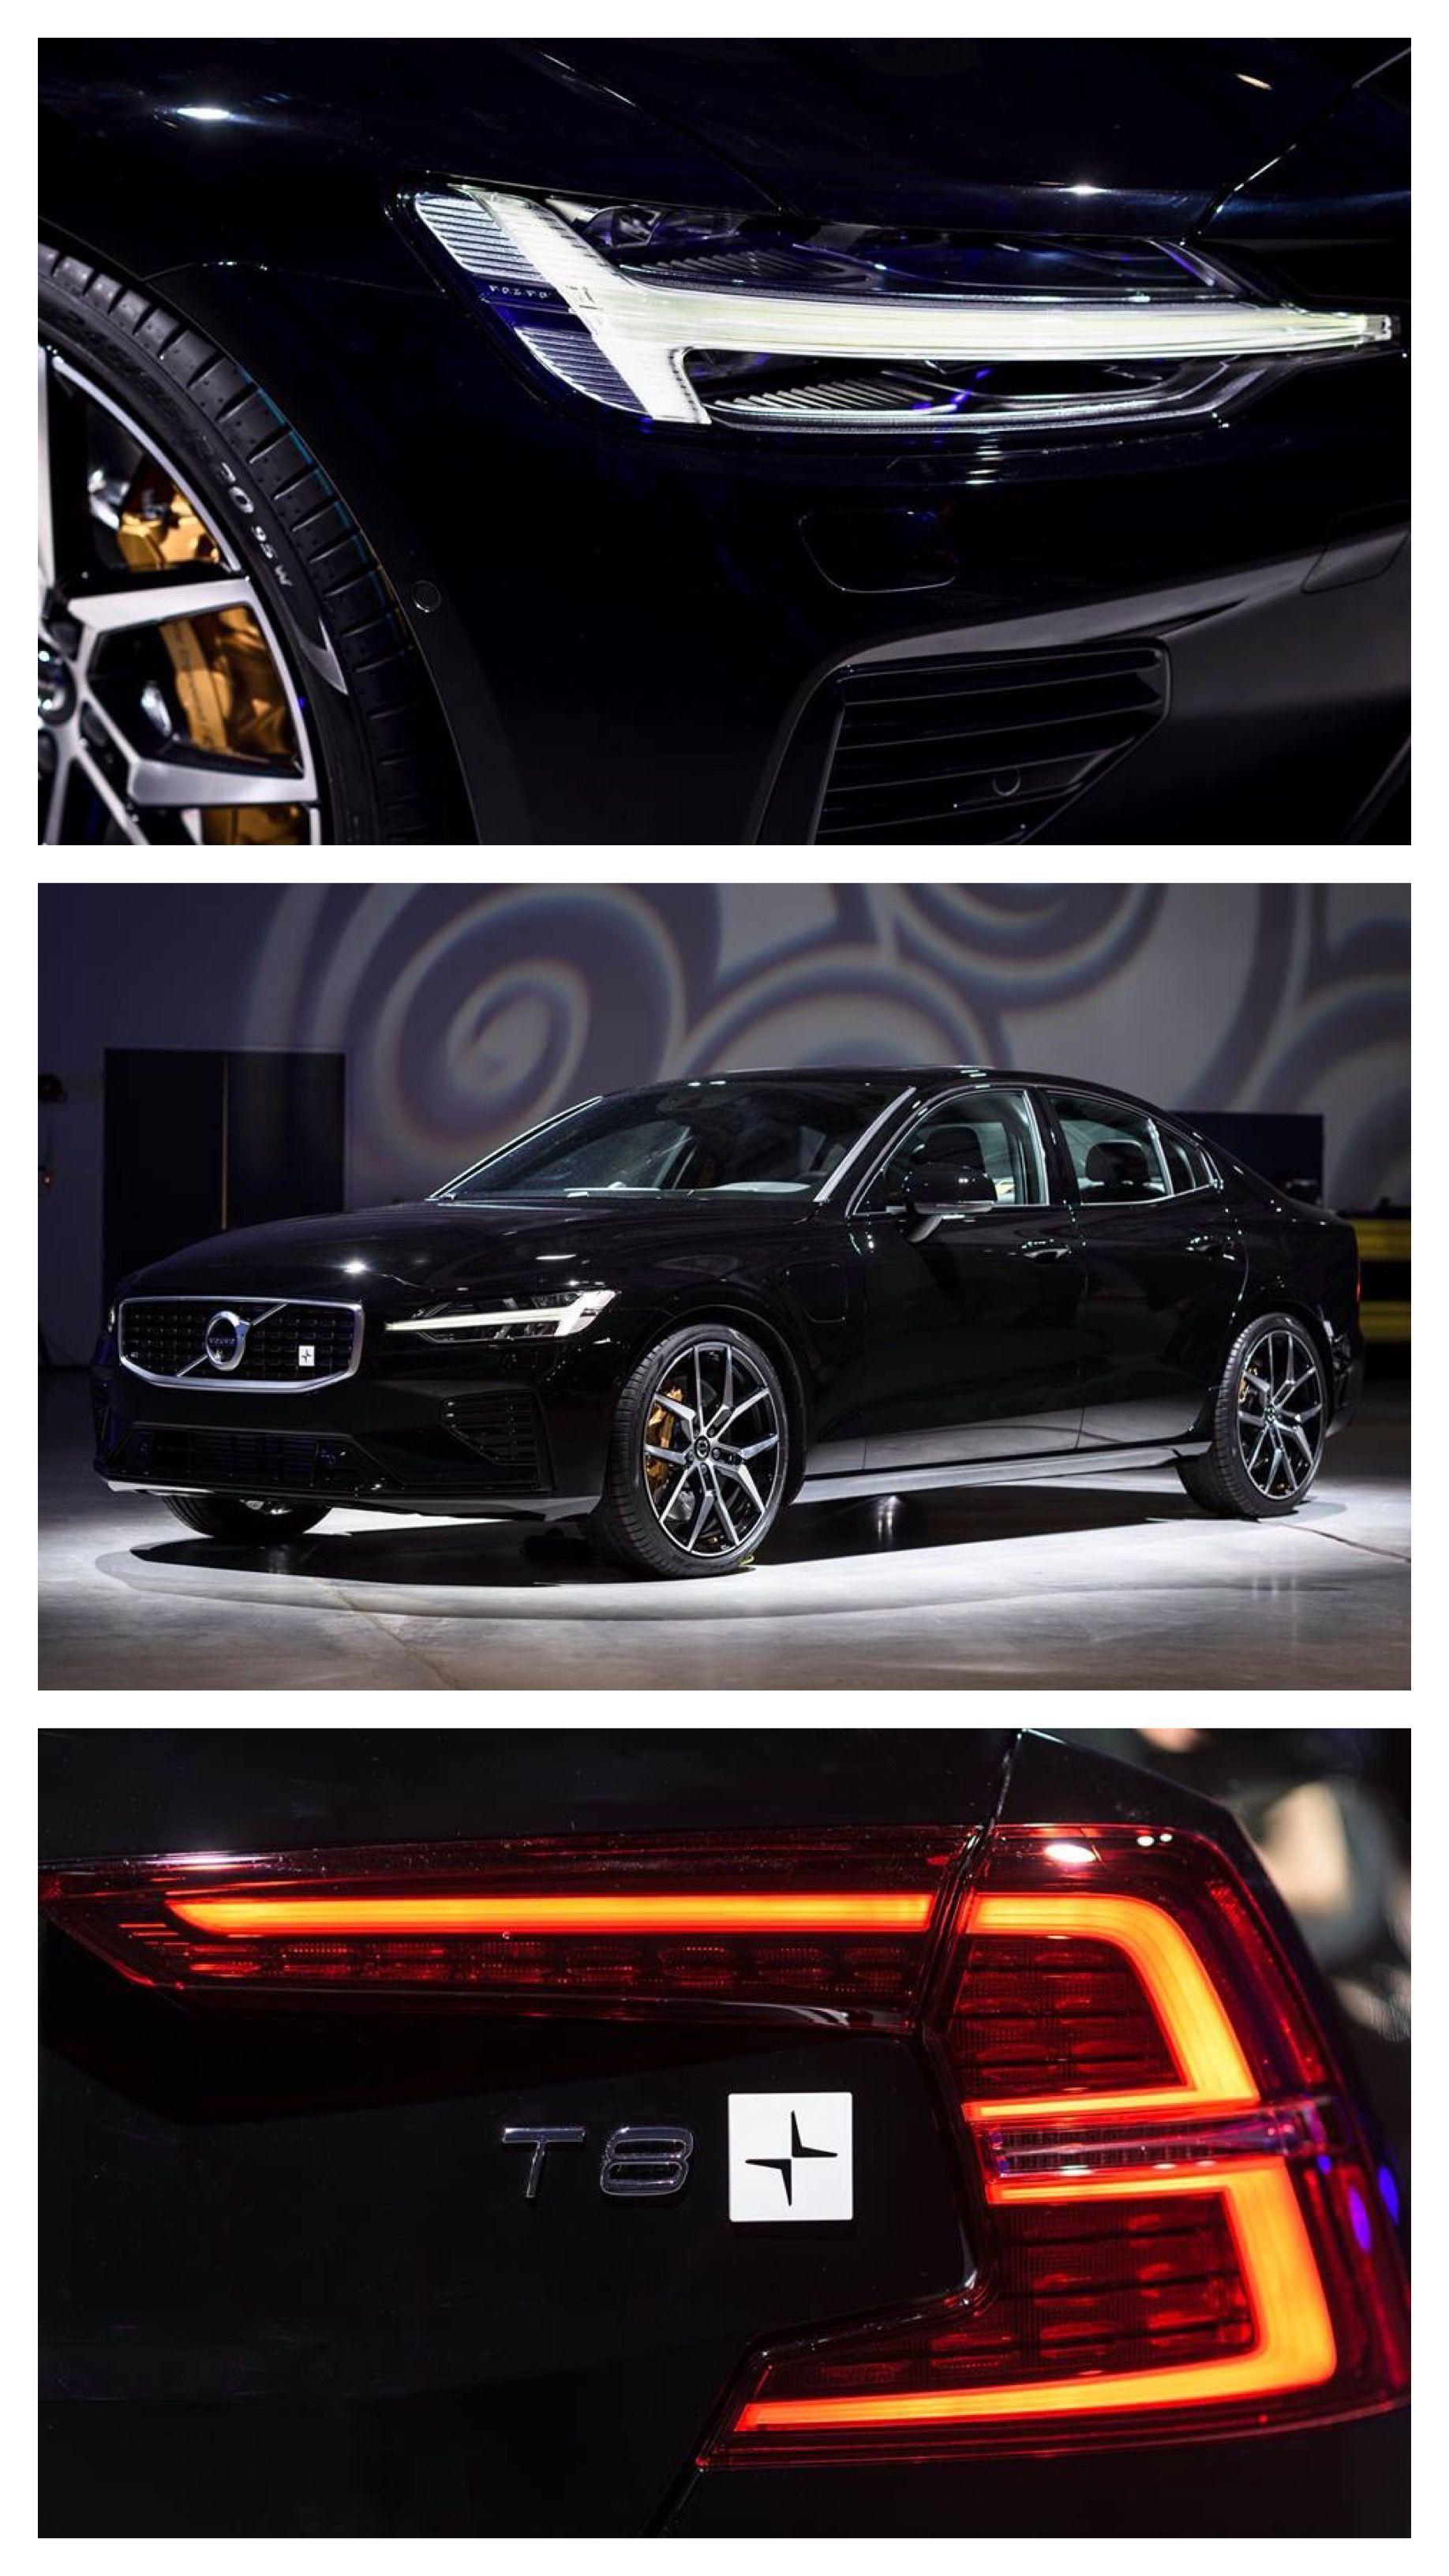 2019 S60 T8 Polestar Engineered Hybrid Luxury Sedan 2019 S60 Polestar Electric Hybrid Sedan Volvo Car Usa The S60 T8 Polestar Engineered Is A Performance Bilar